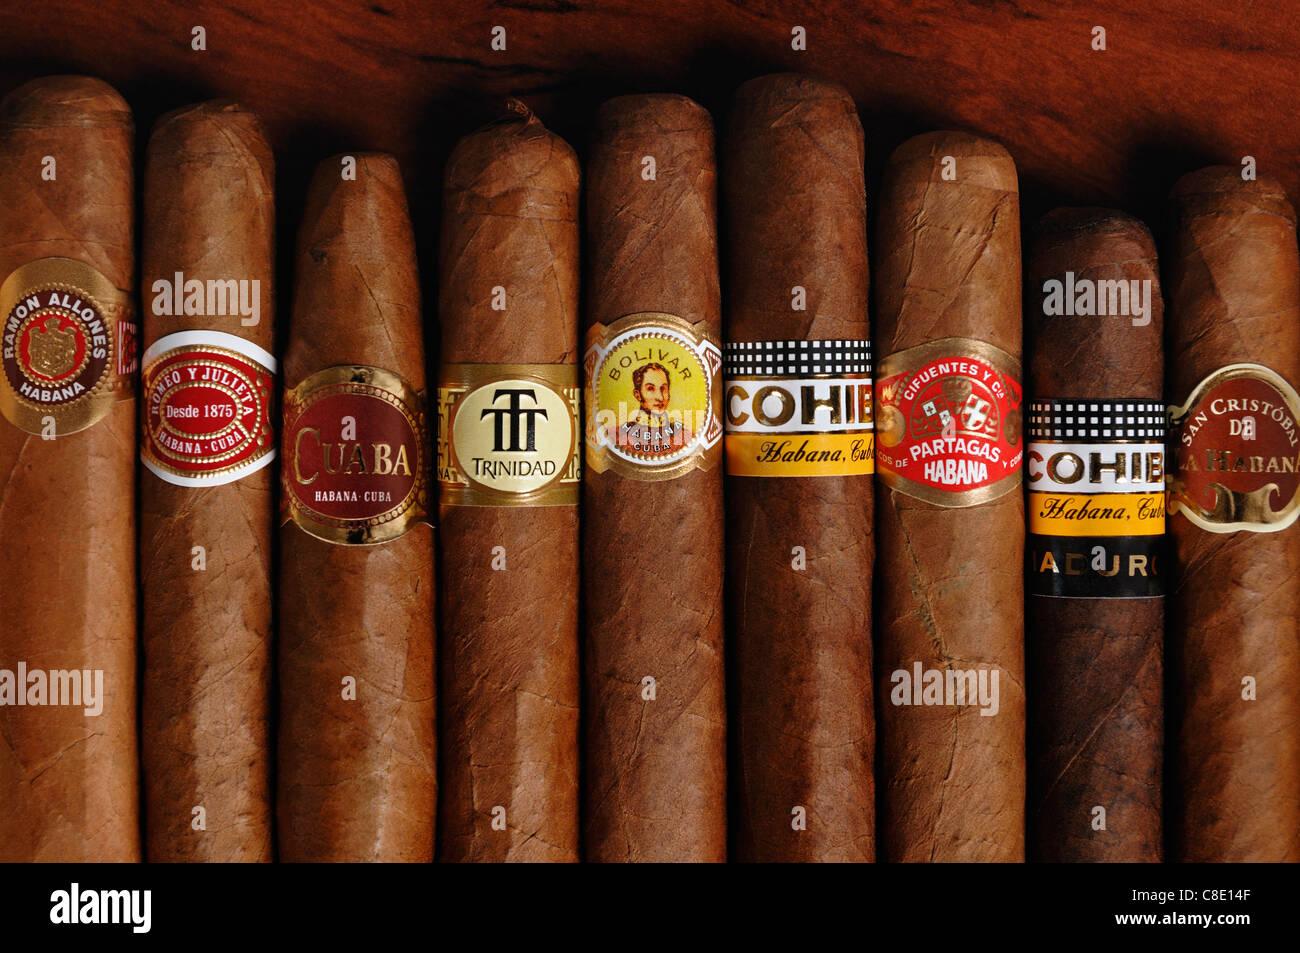 Cuban Cigars - Stock Image